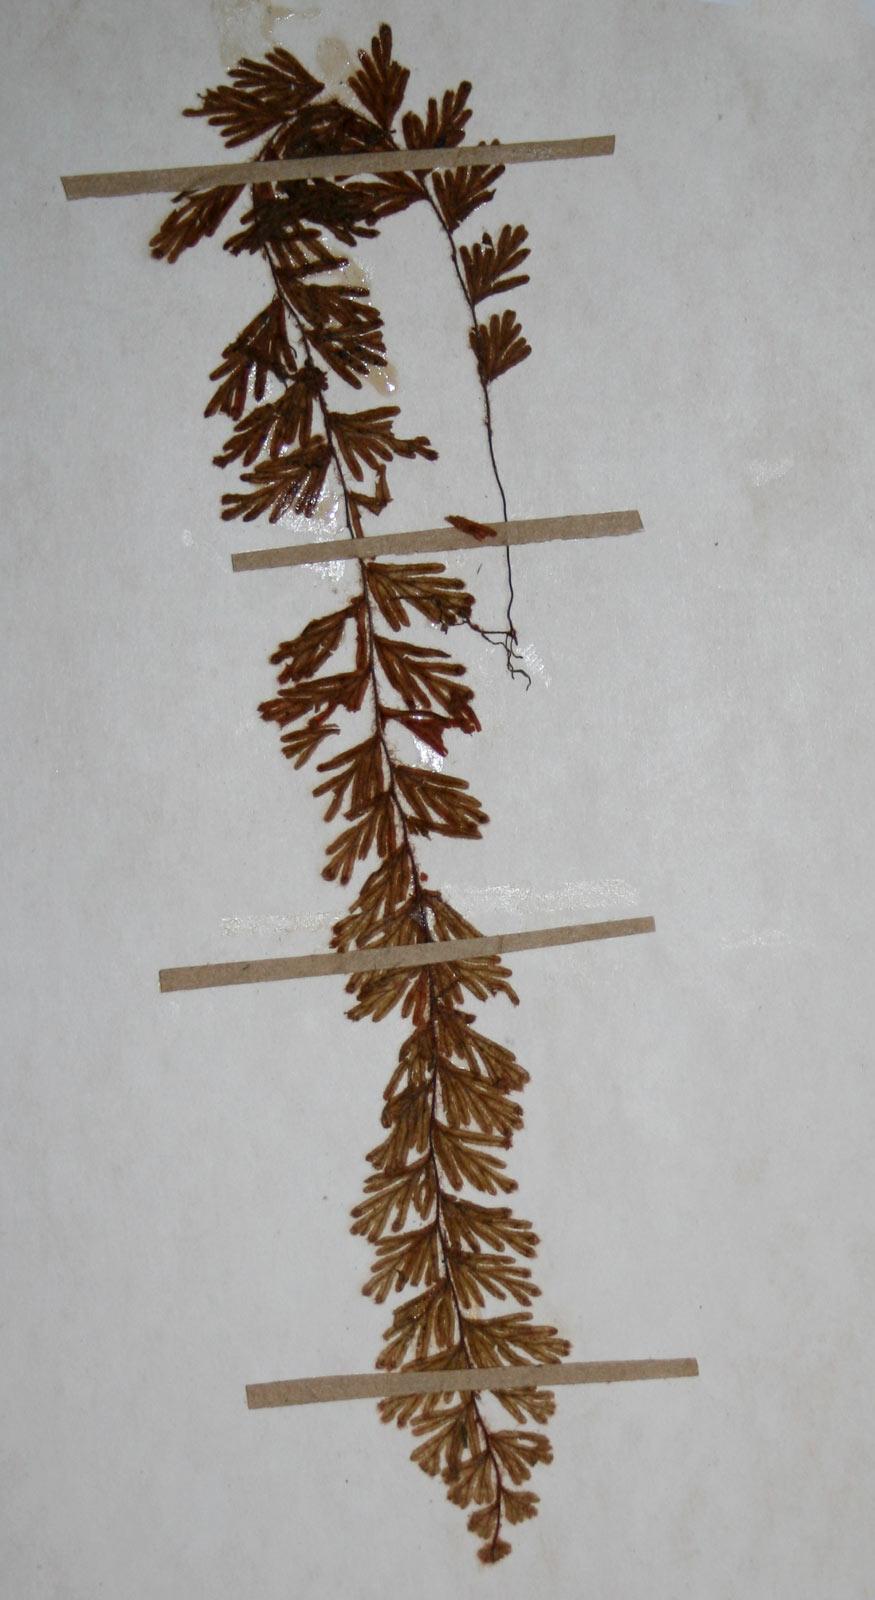 Hymenophyllum capillare var. alternialatum